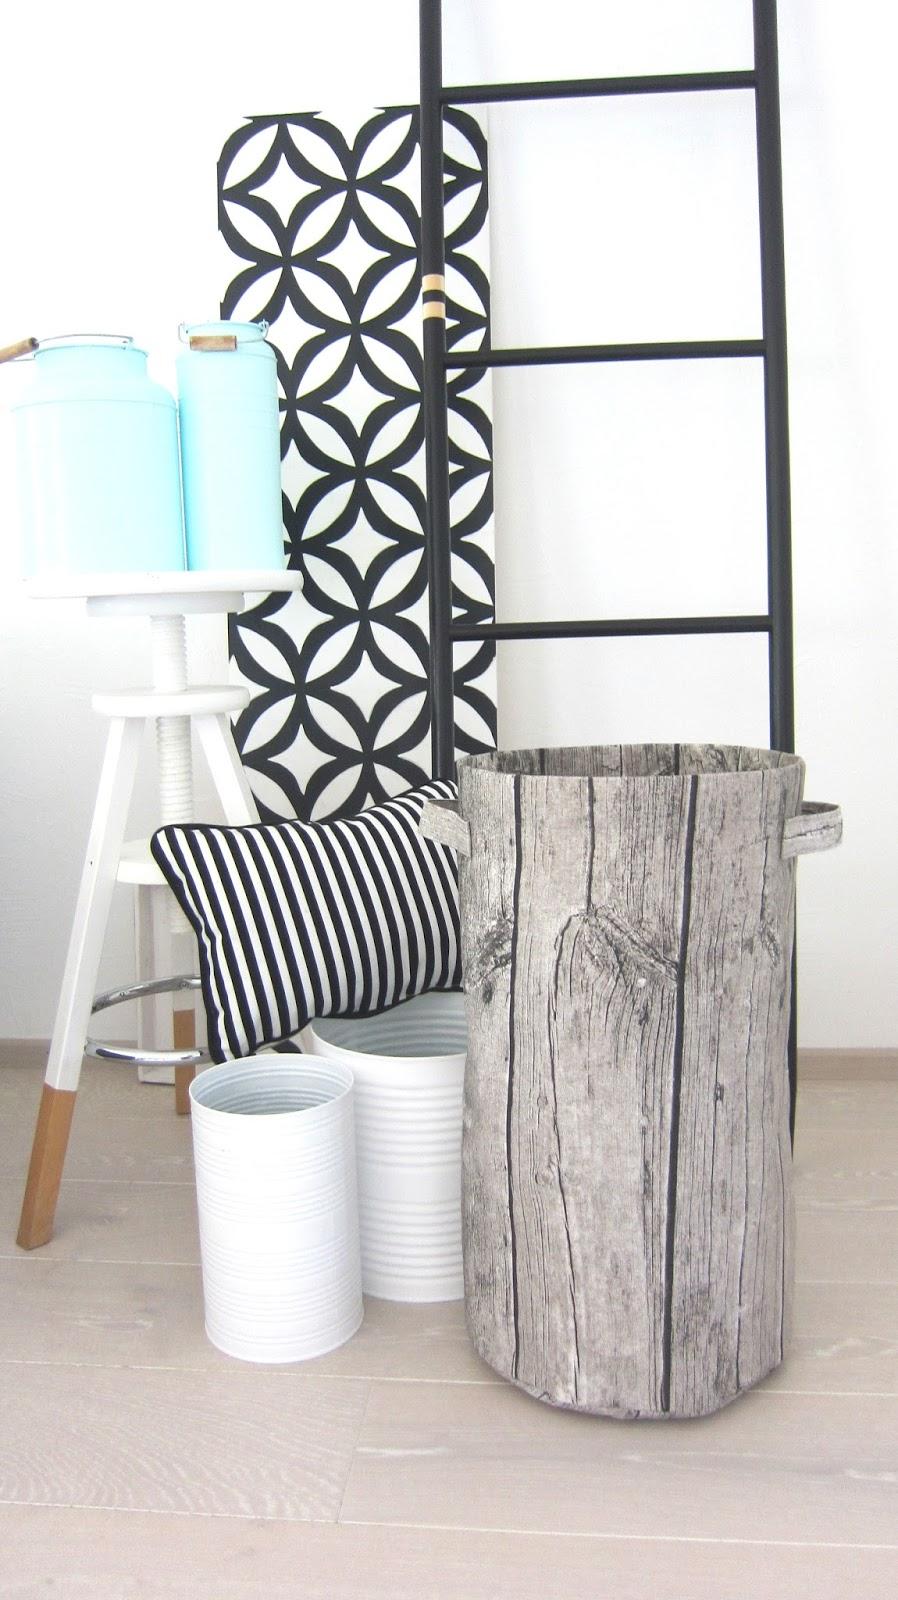 anlukaa glas faden aufbewahrung im holz look. Black Bedroom Furniture Sets. Home Design Ideas